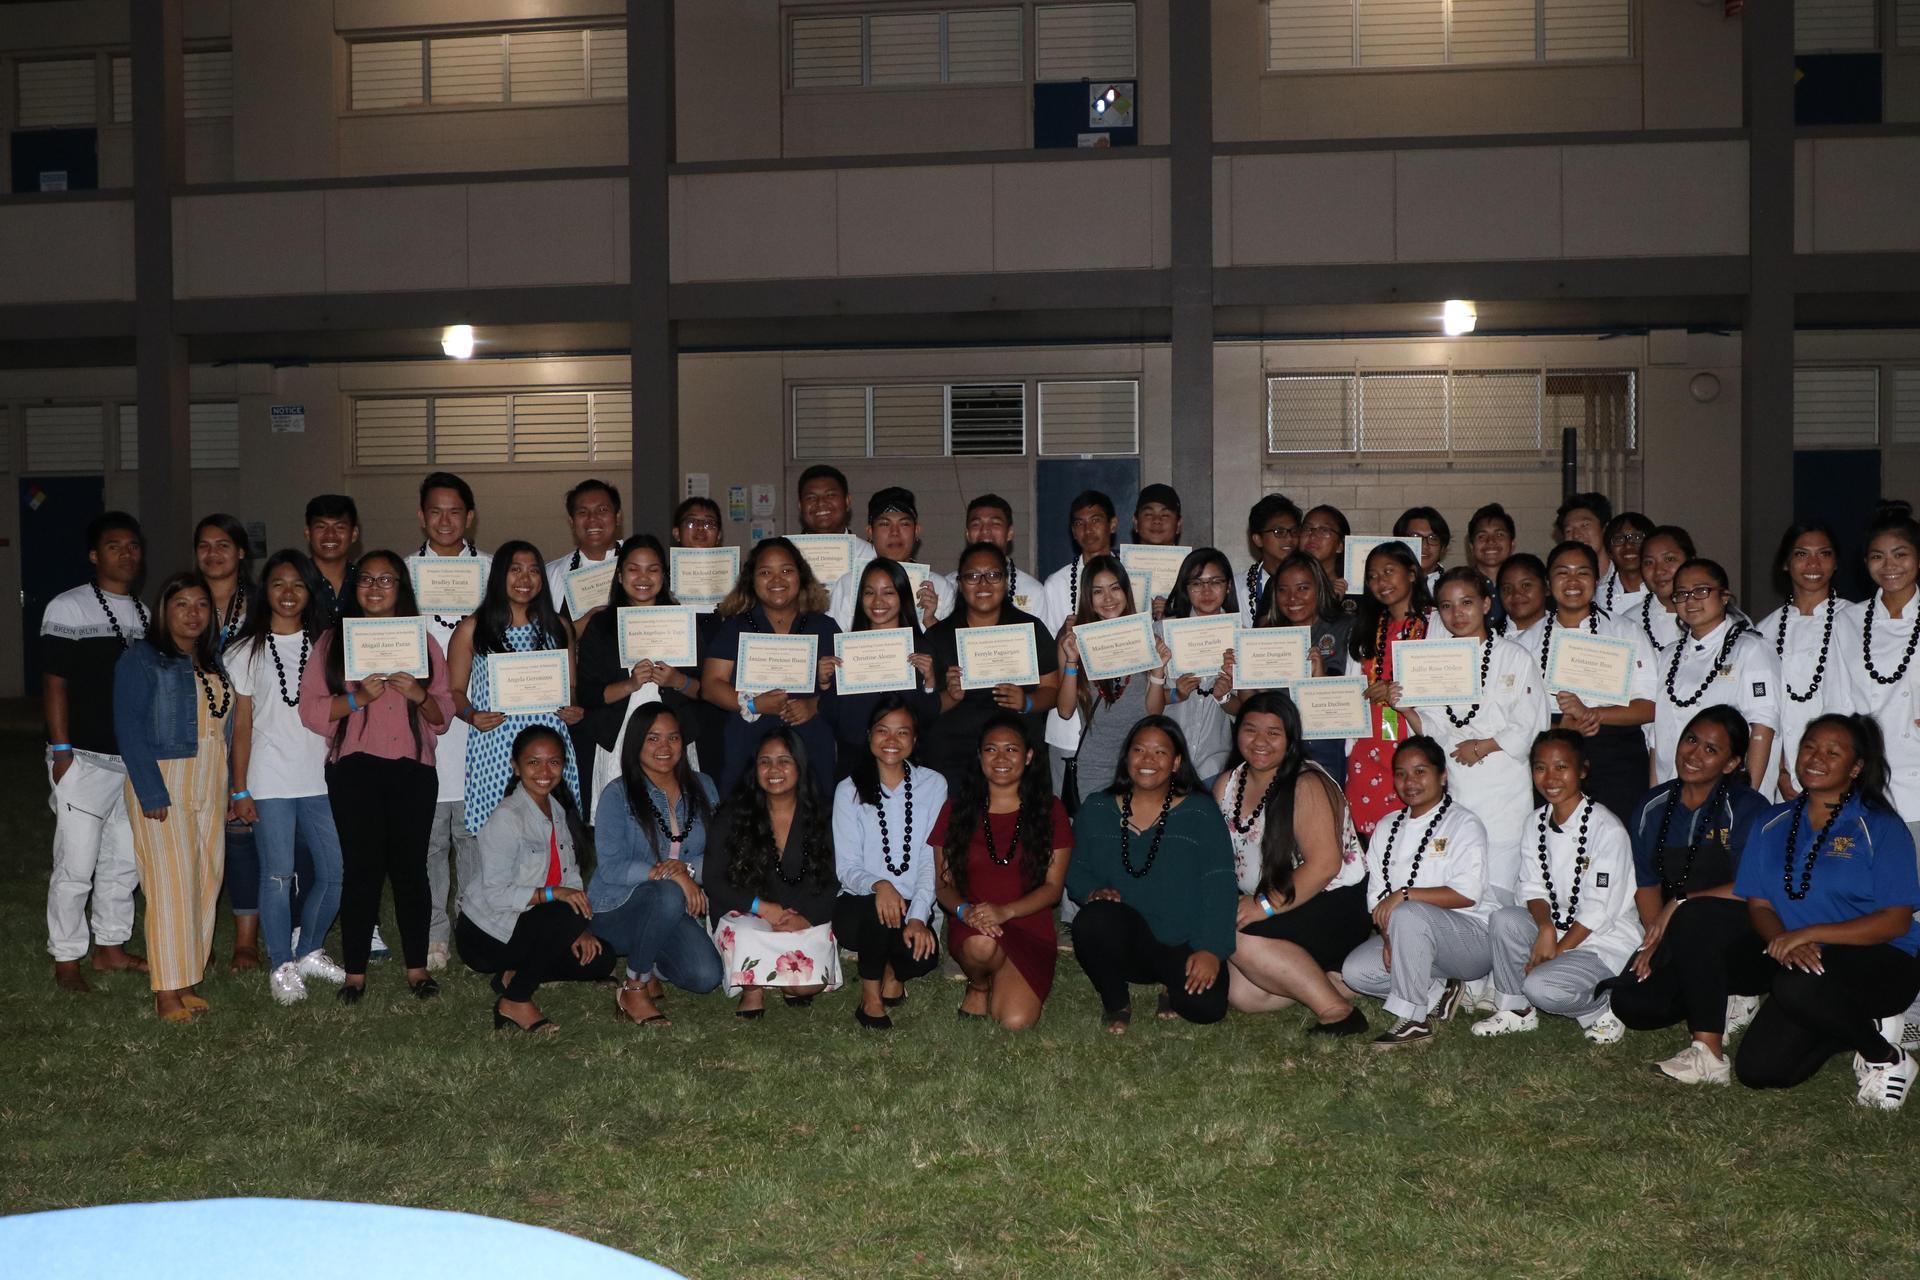 APPS Scholarship Recipients at Family Night